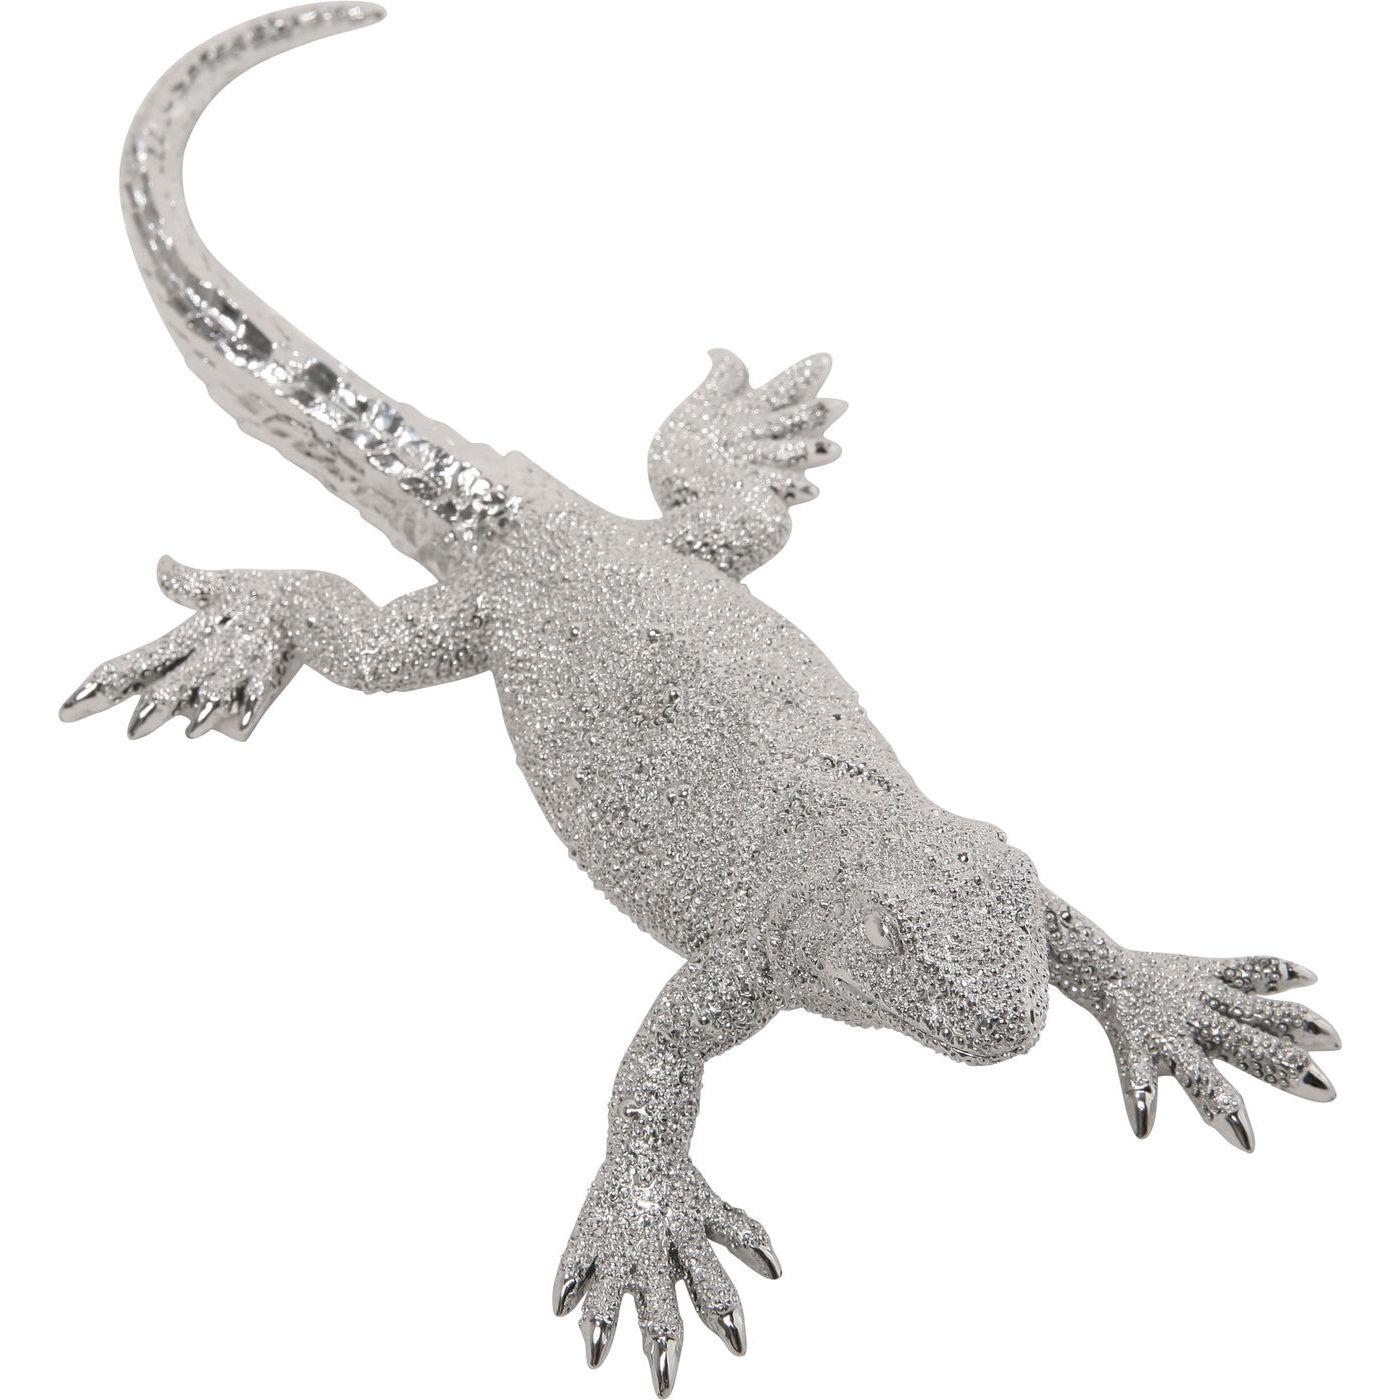 Deko Figur Lizard Silber Medium